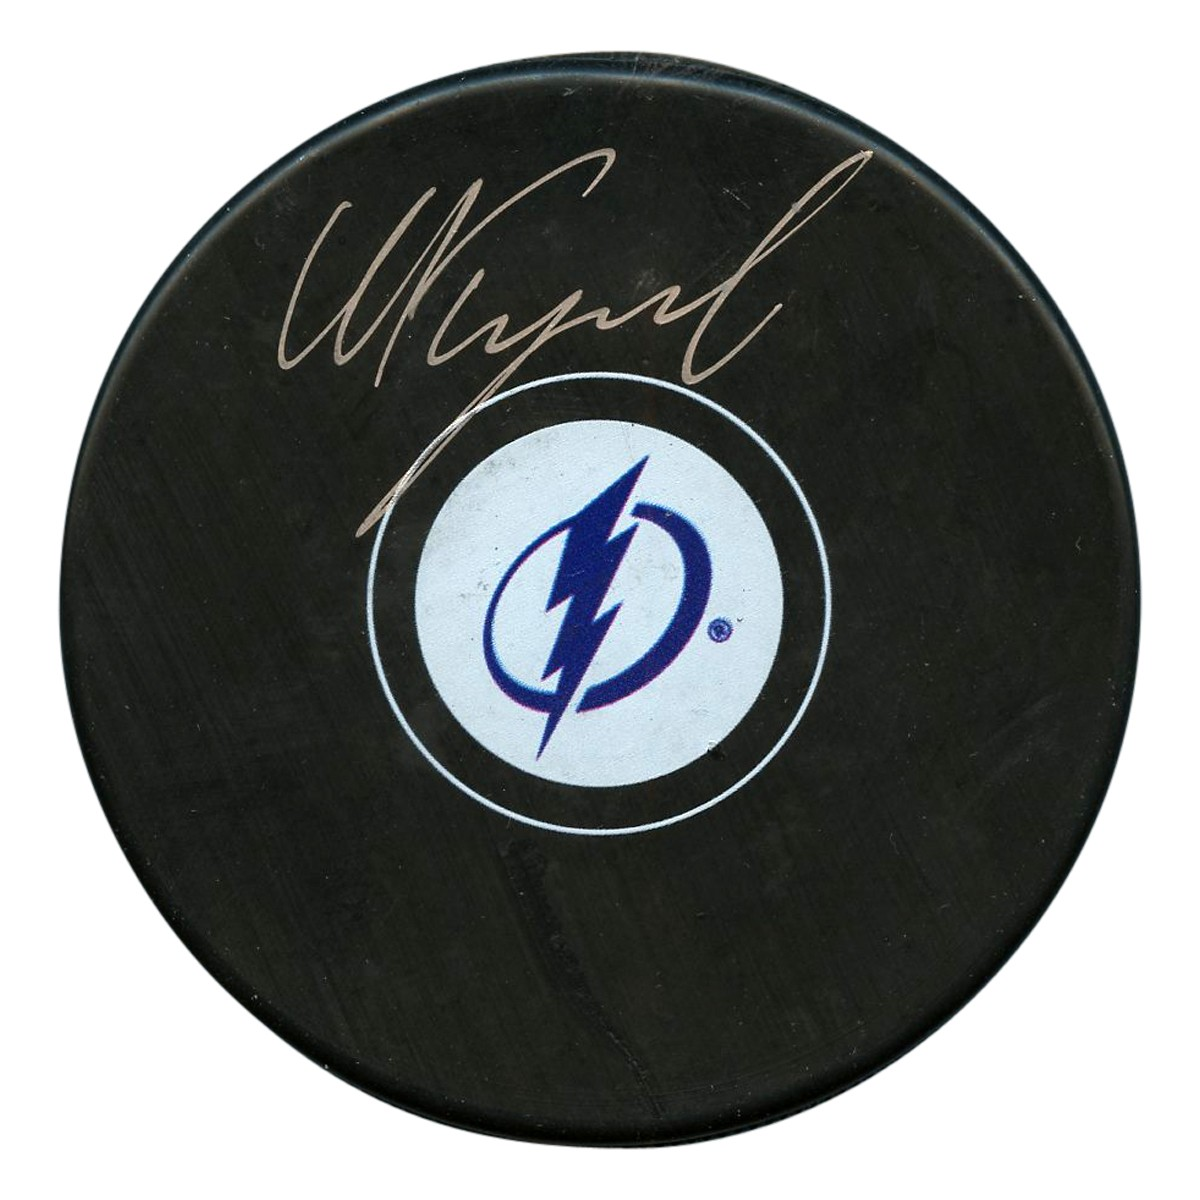 f53503d74 Nikita Kucherov Autographed Signed Tampa Bay Lightning Logo Puck - JSA  Authentic